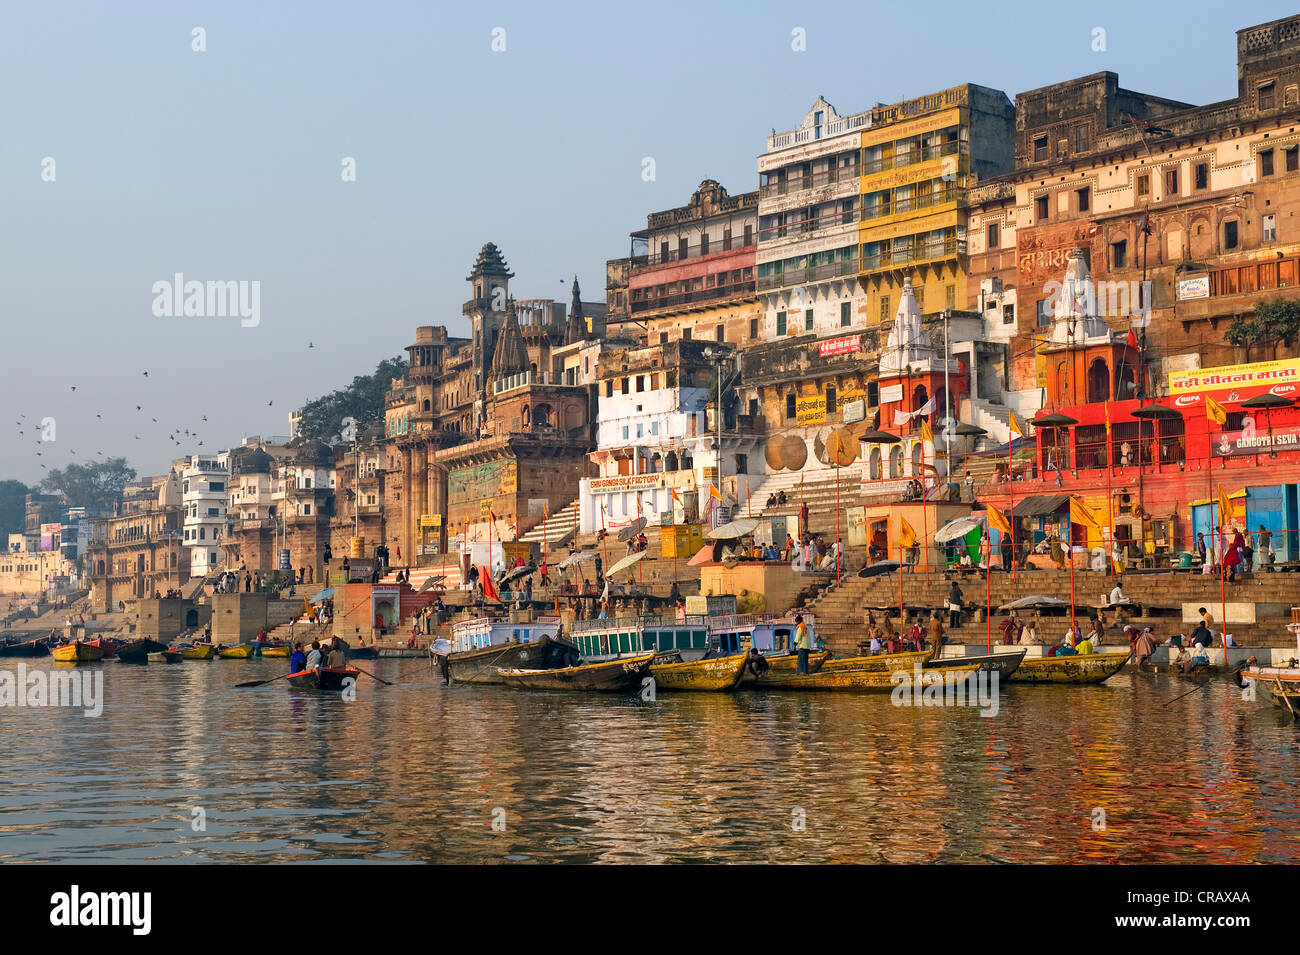 Ghats o pasos de santo Ganges, Varanasi, Uttar Pradesh, India, Asia Imagen De Stock